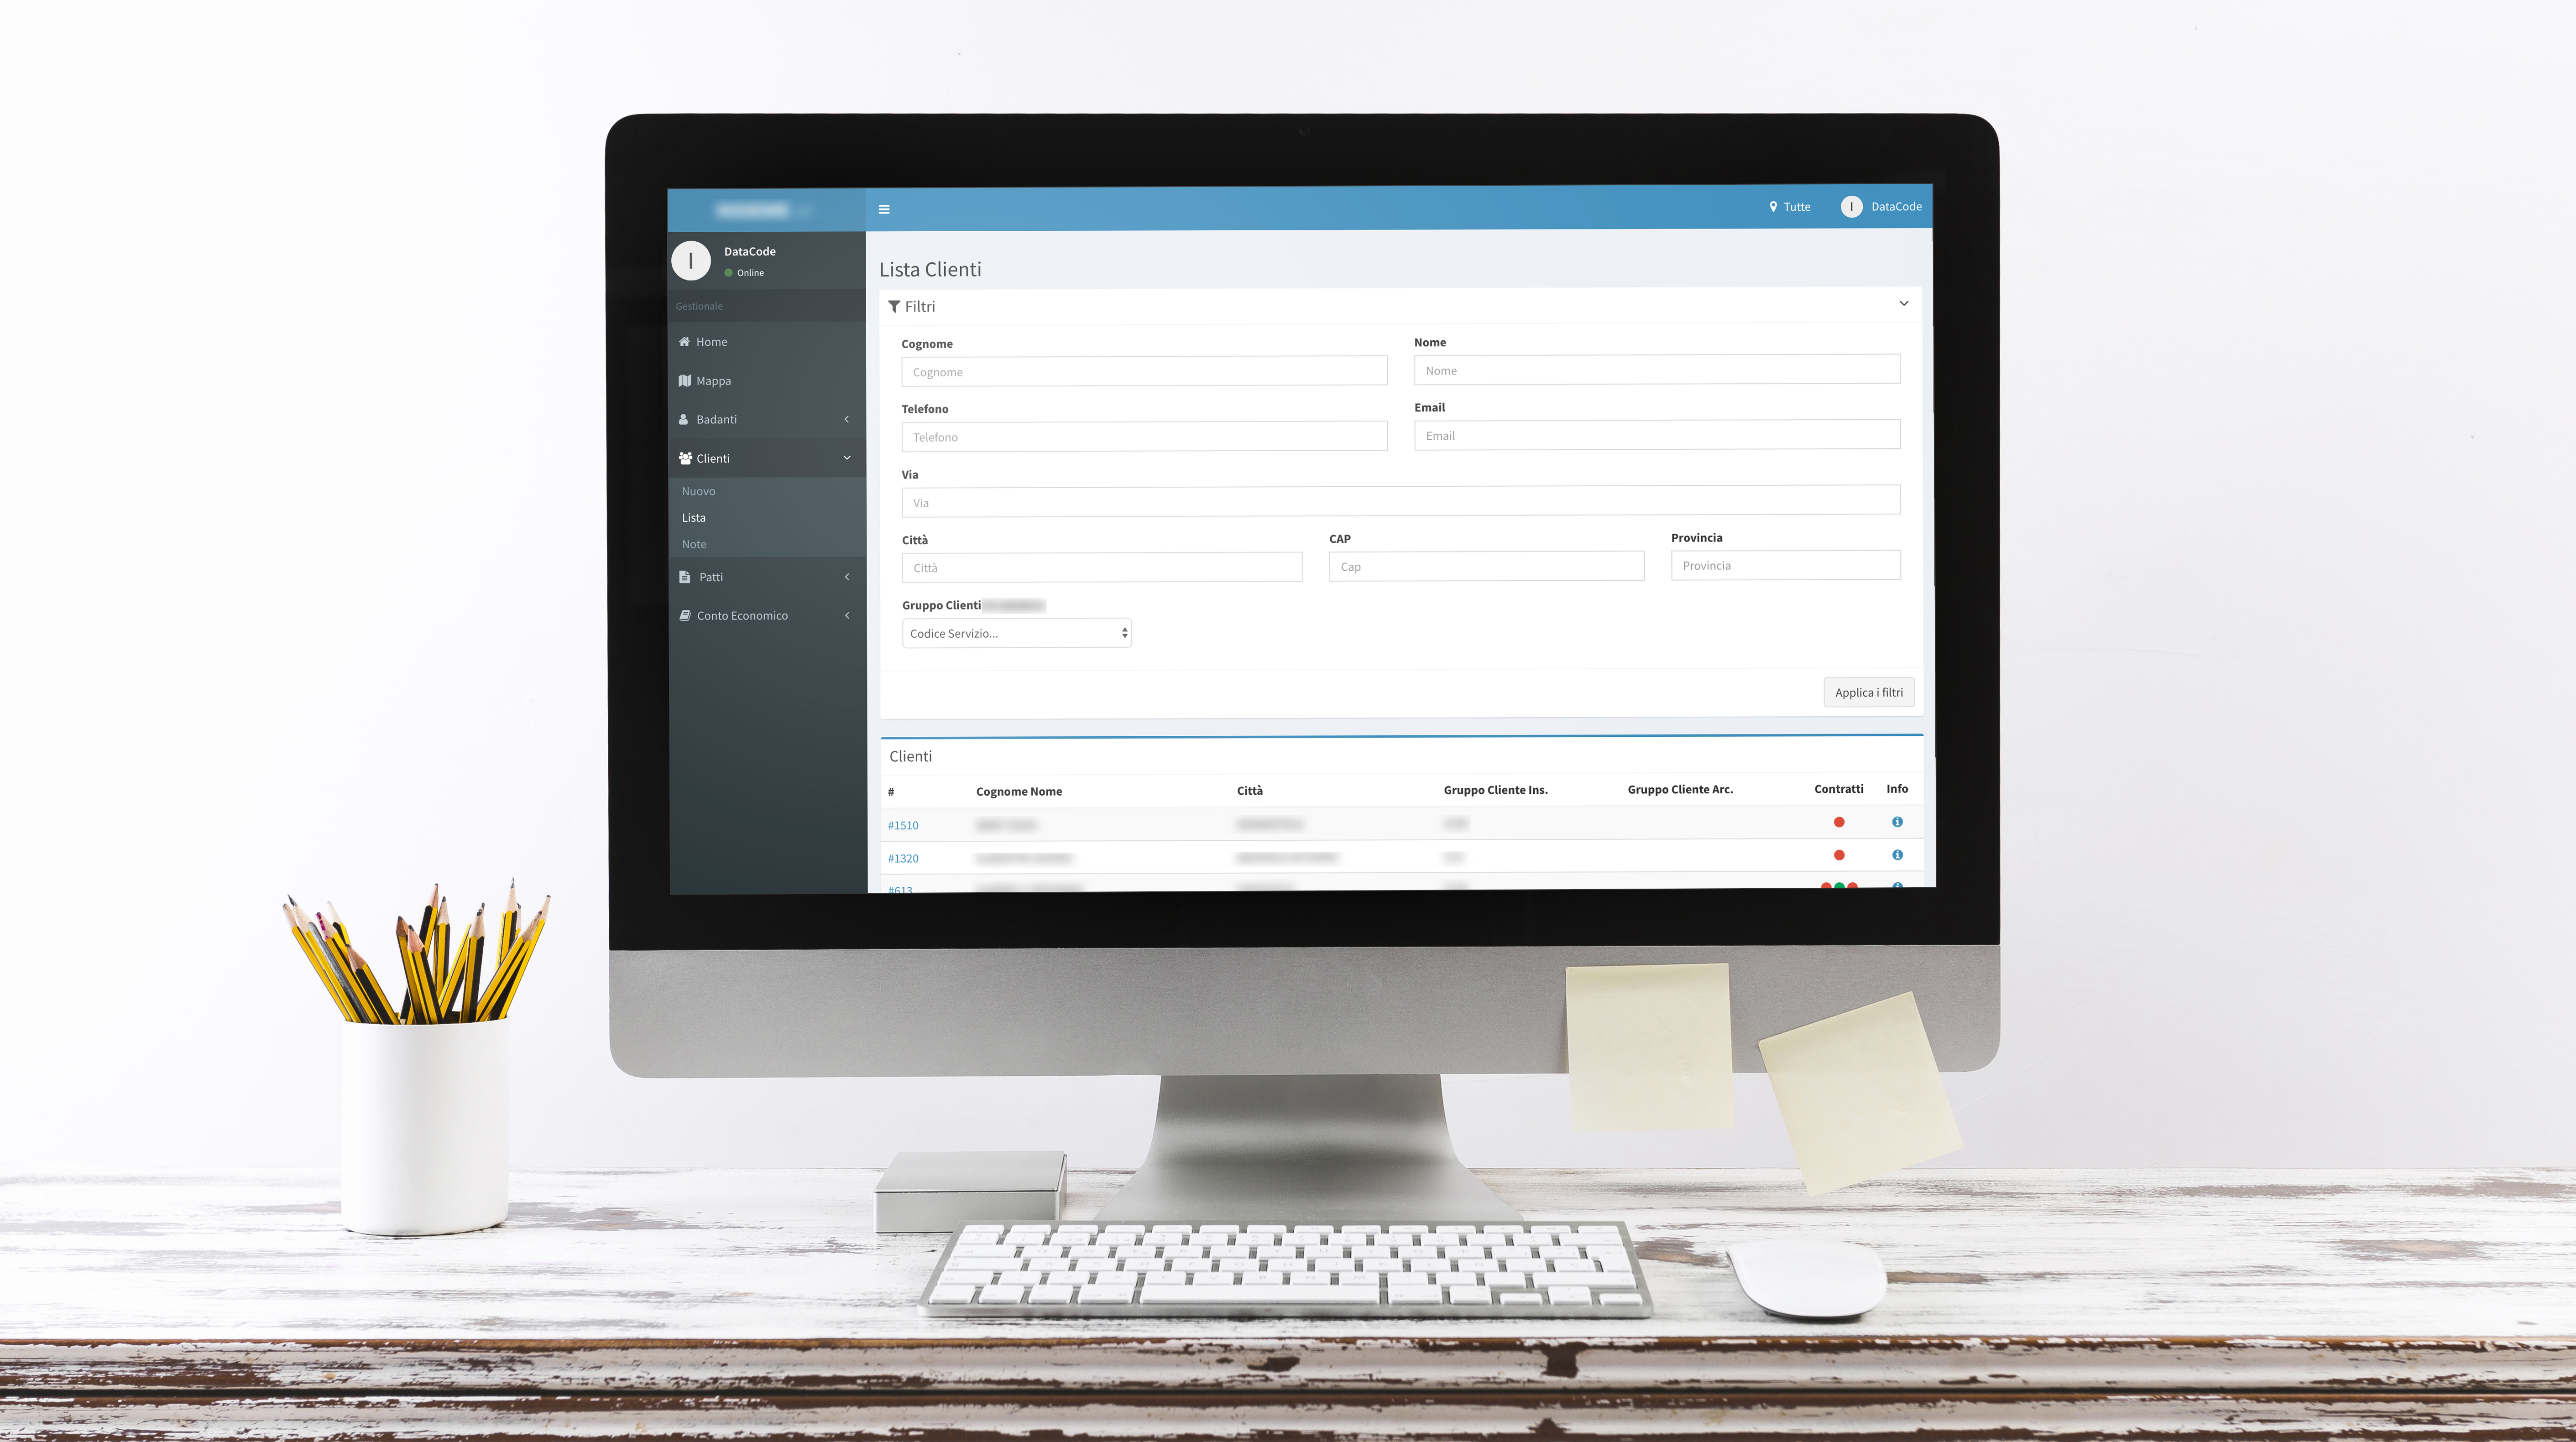 Software Gestione Badanti per Agenzie di lavoro